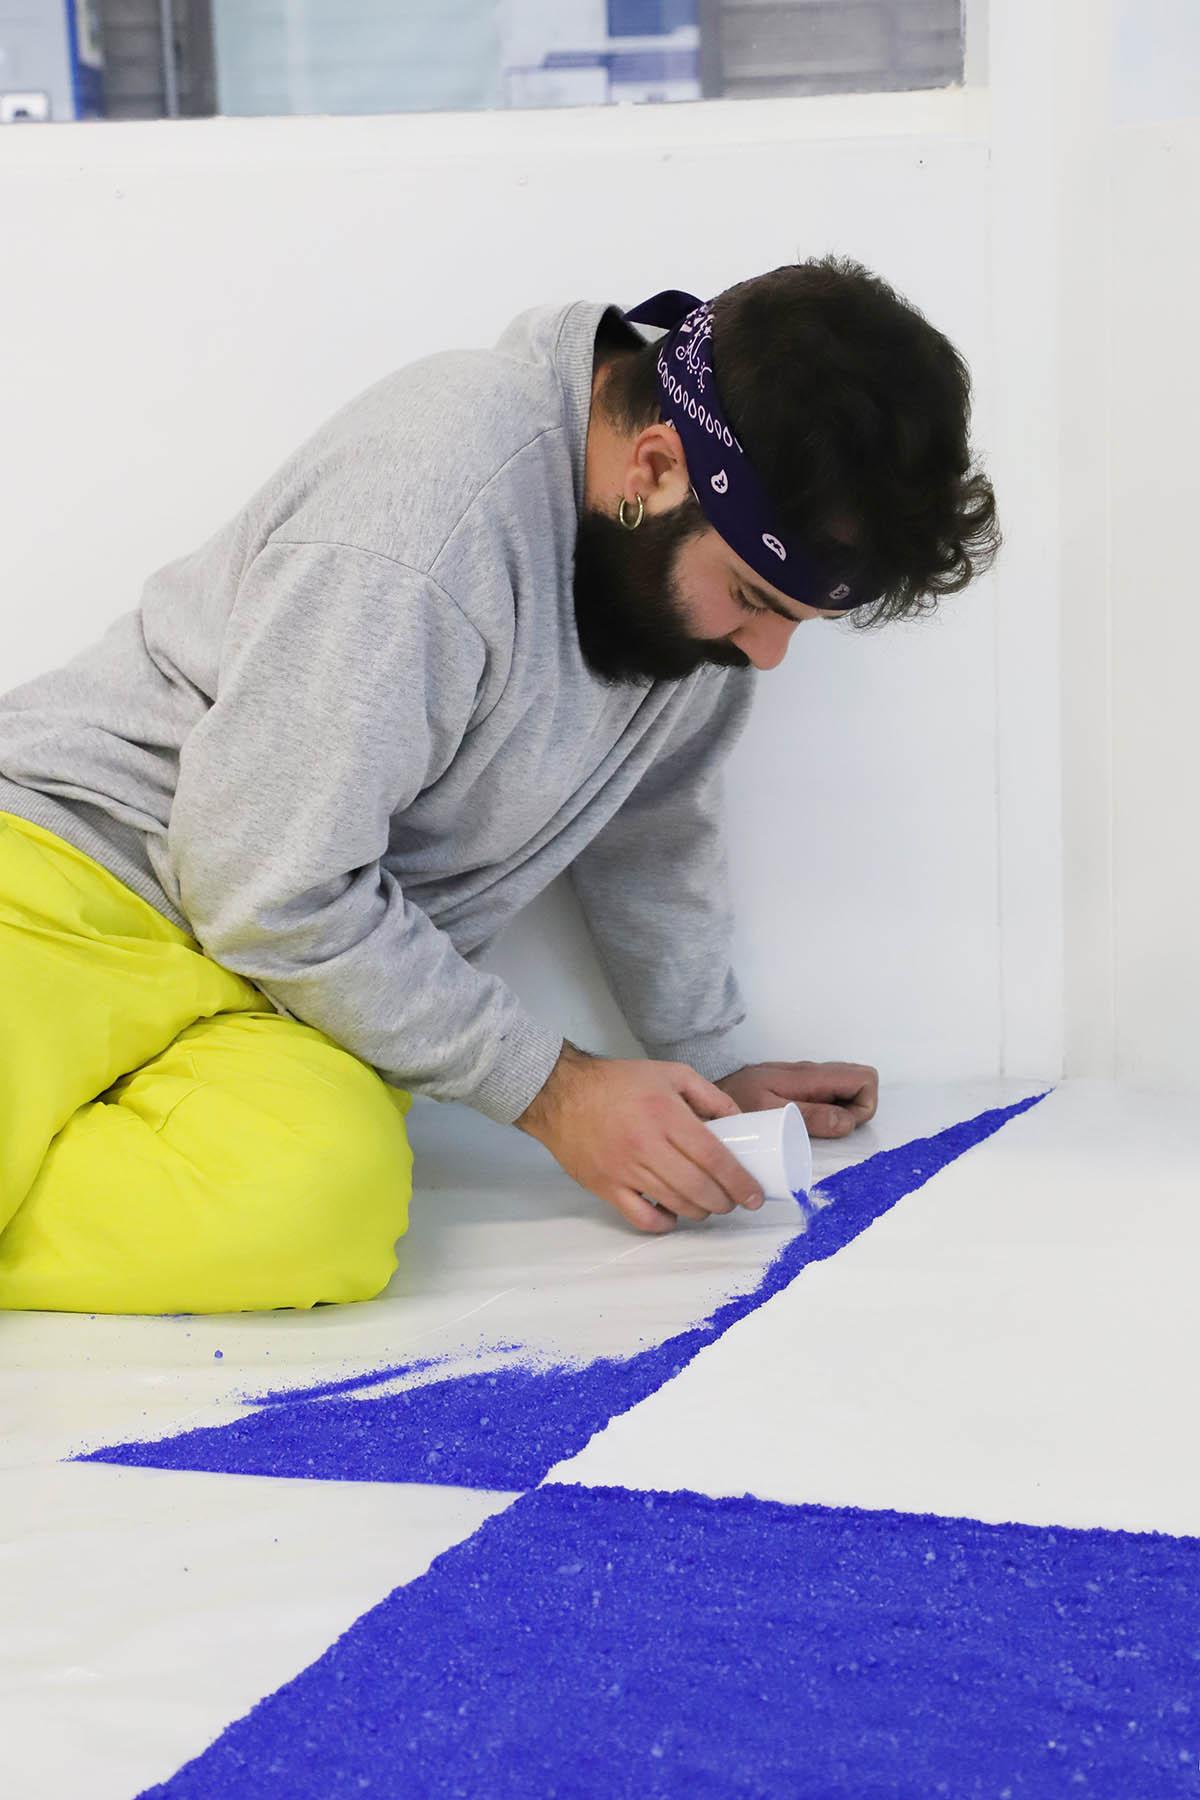 Artist. Alessio Barchitta